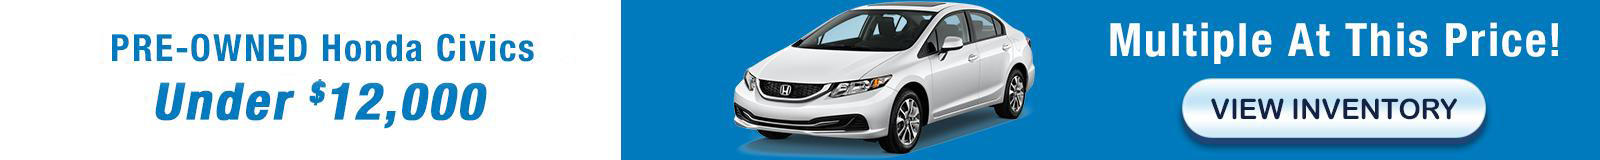 2013 Honda Civics 12900